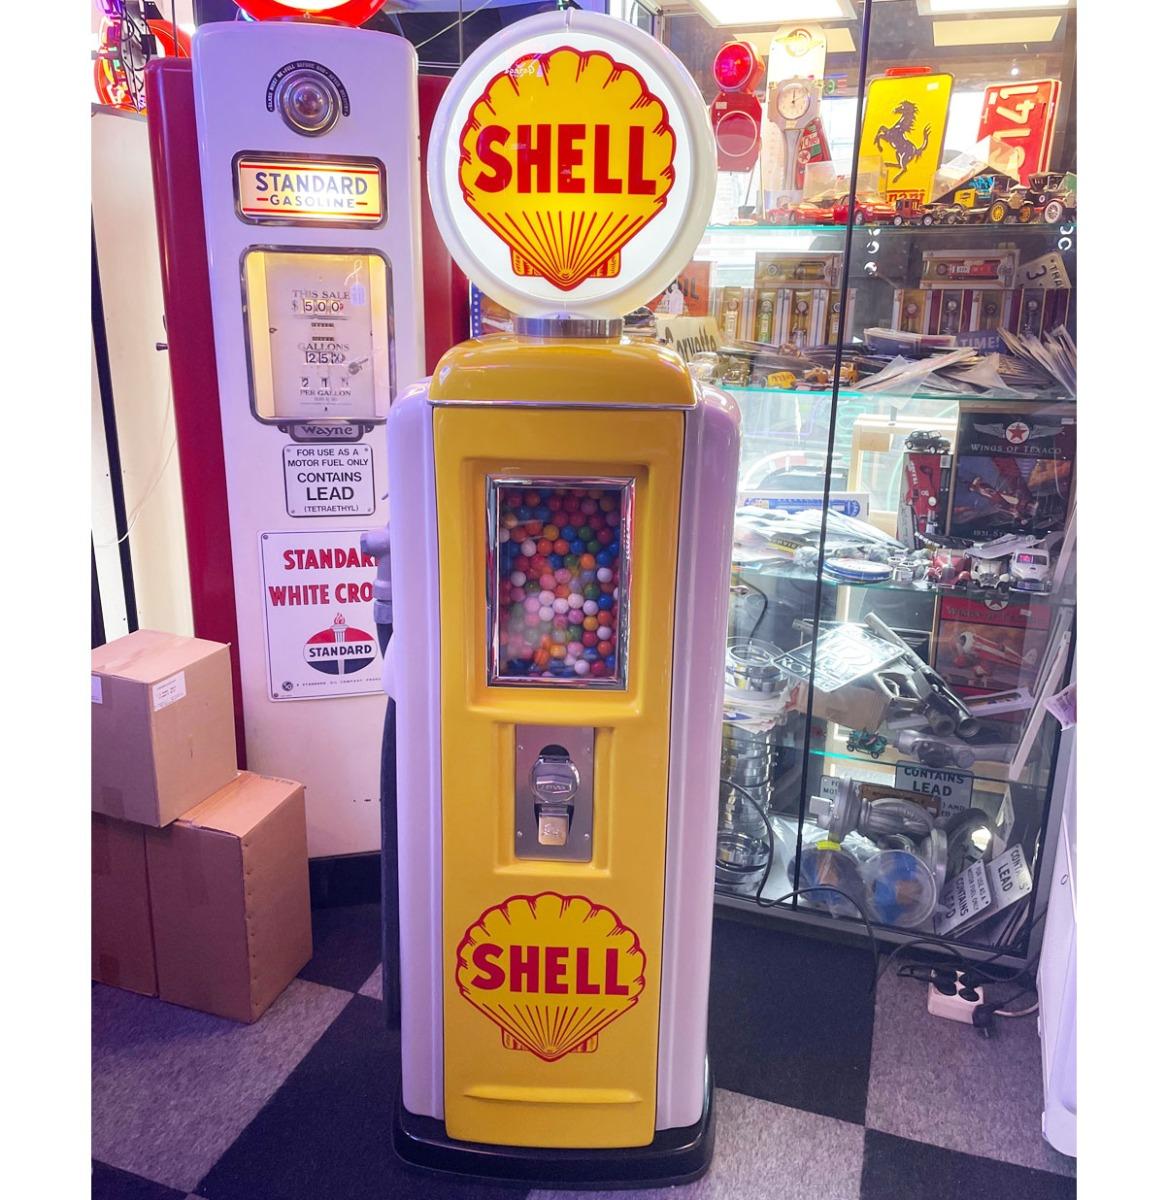 Tokheim 39 Benzinepomp Kauwgomballen Automaat Shell 0,20 Eurocent